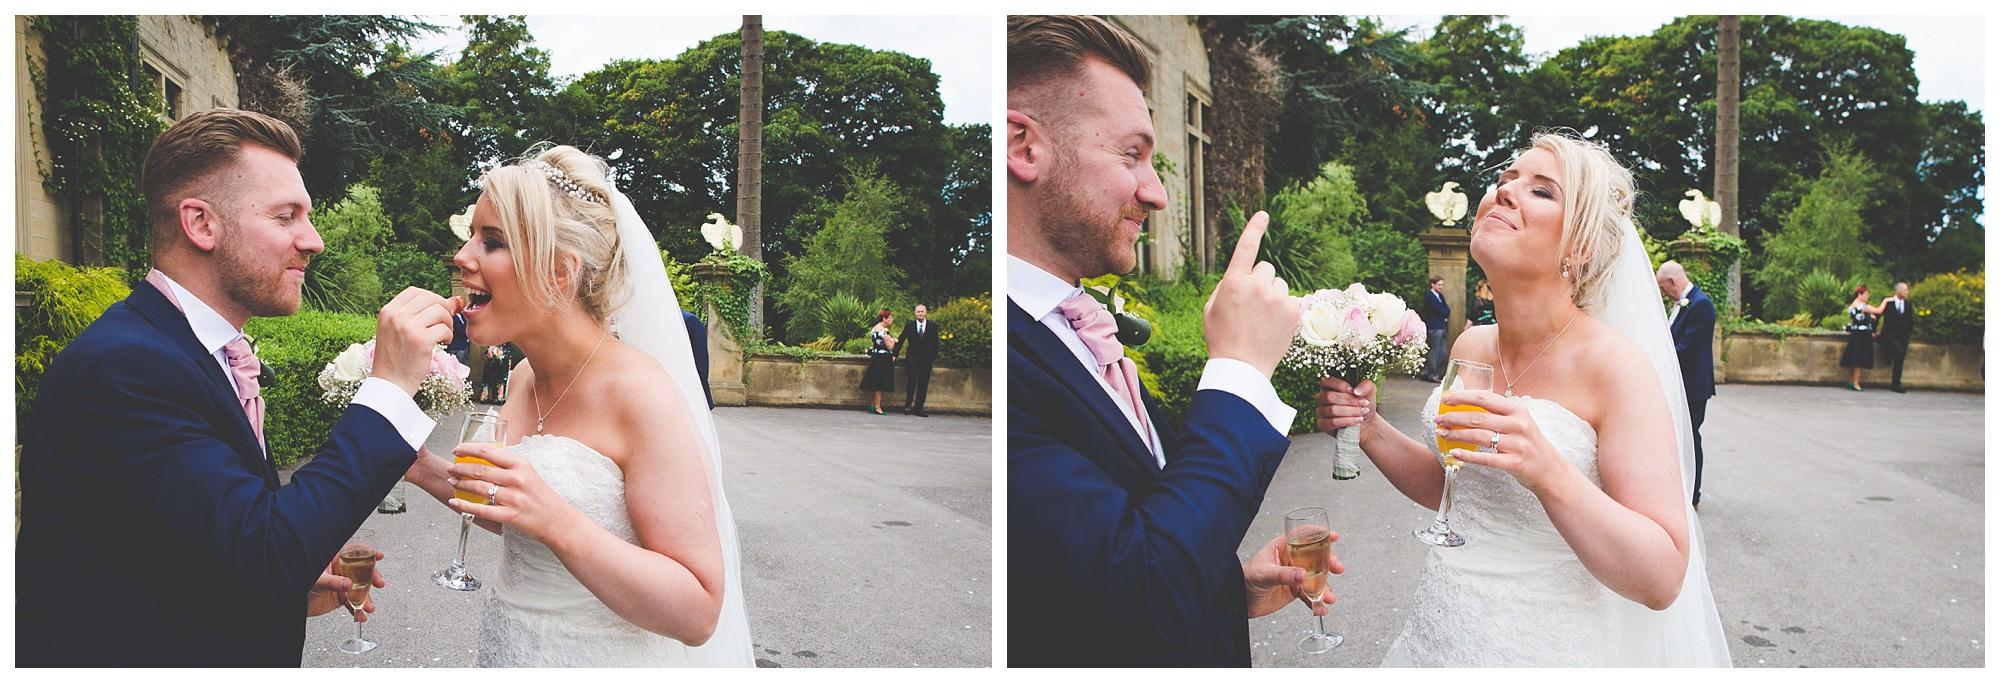 Bagden-Hall-Wedding-Photography_0034